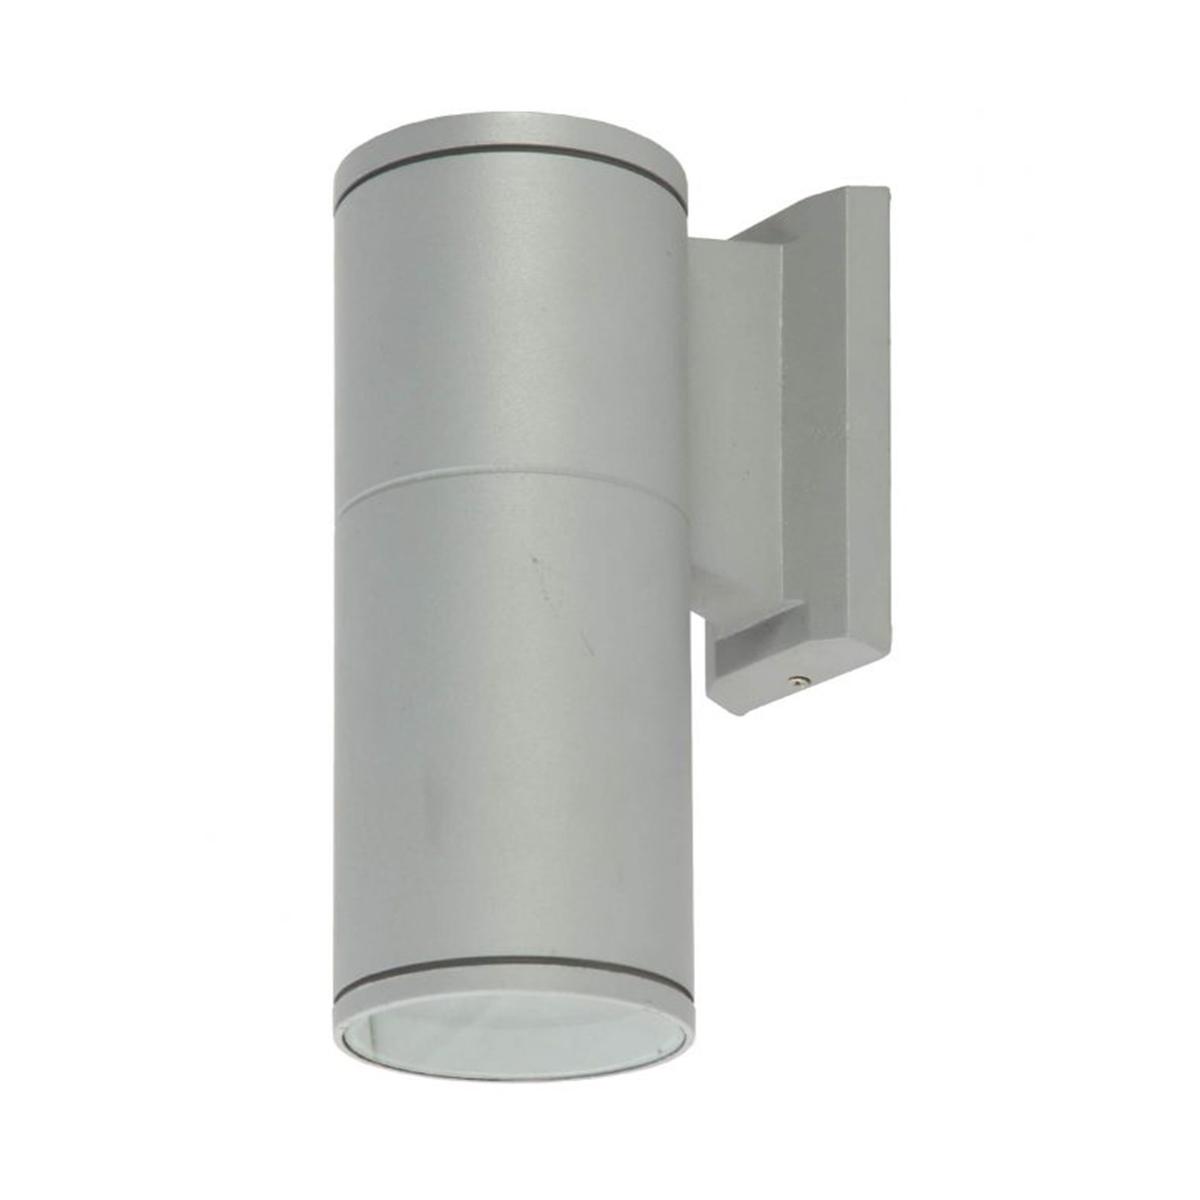 Spoljna zidna lampa  Regola 160 991138 siva